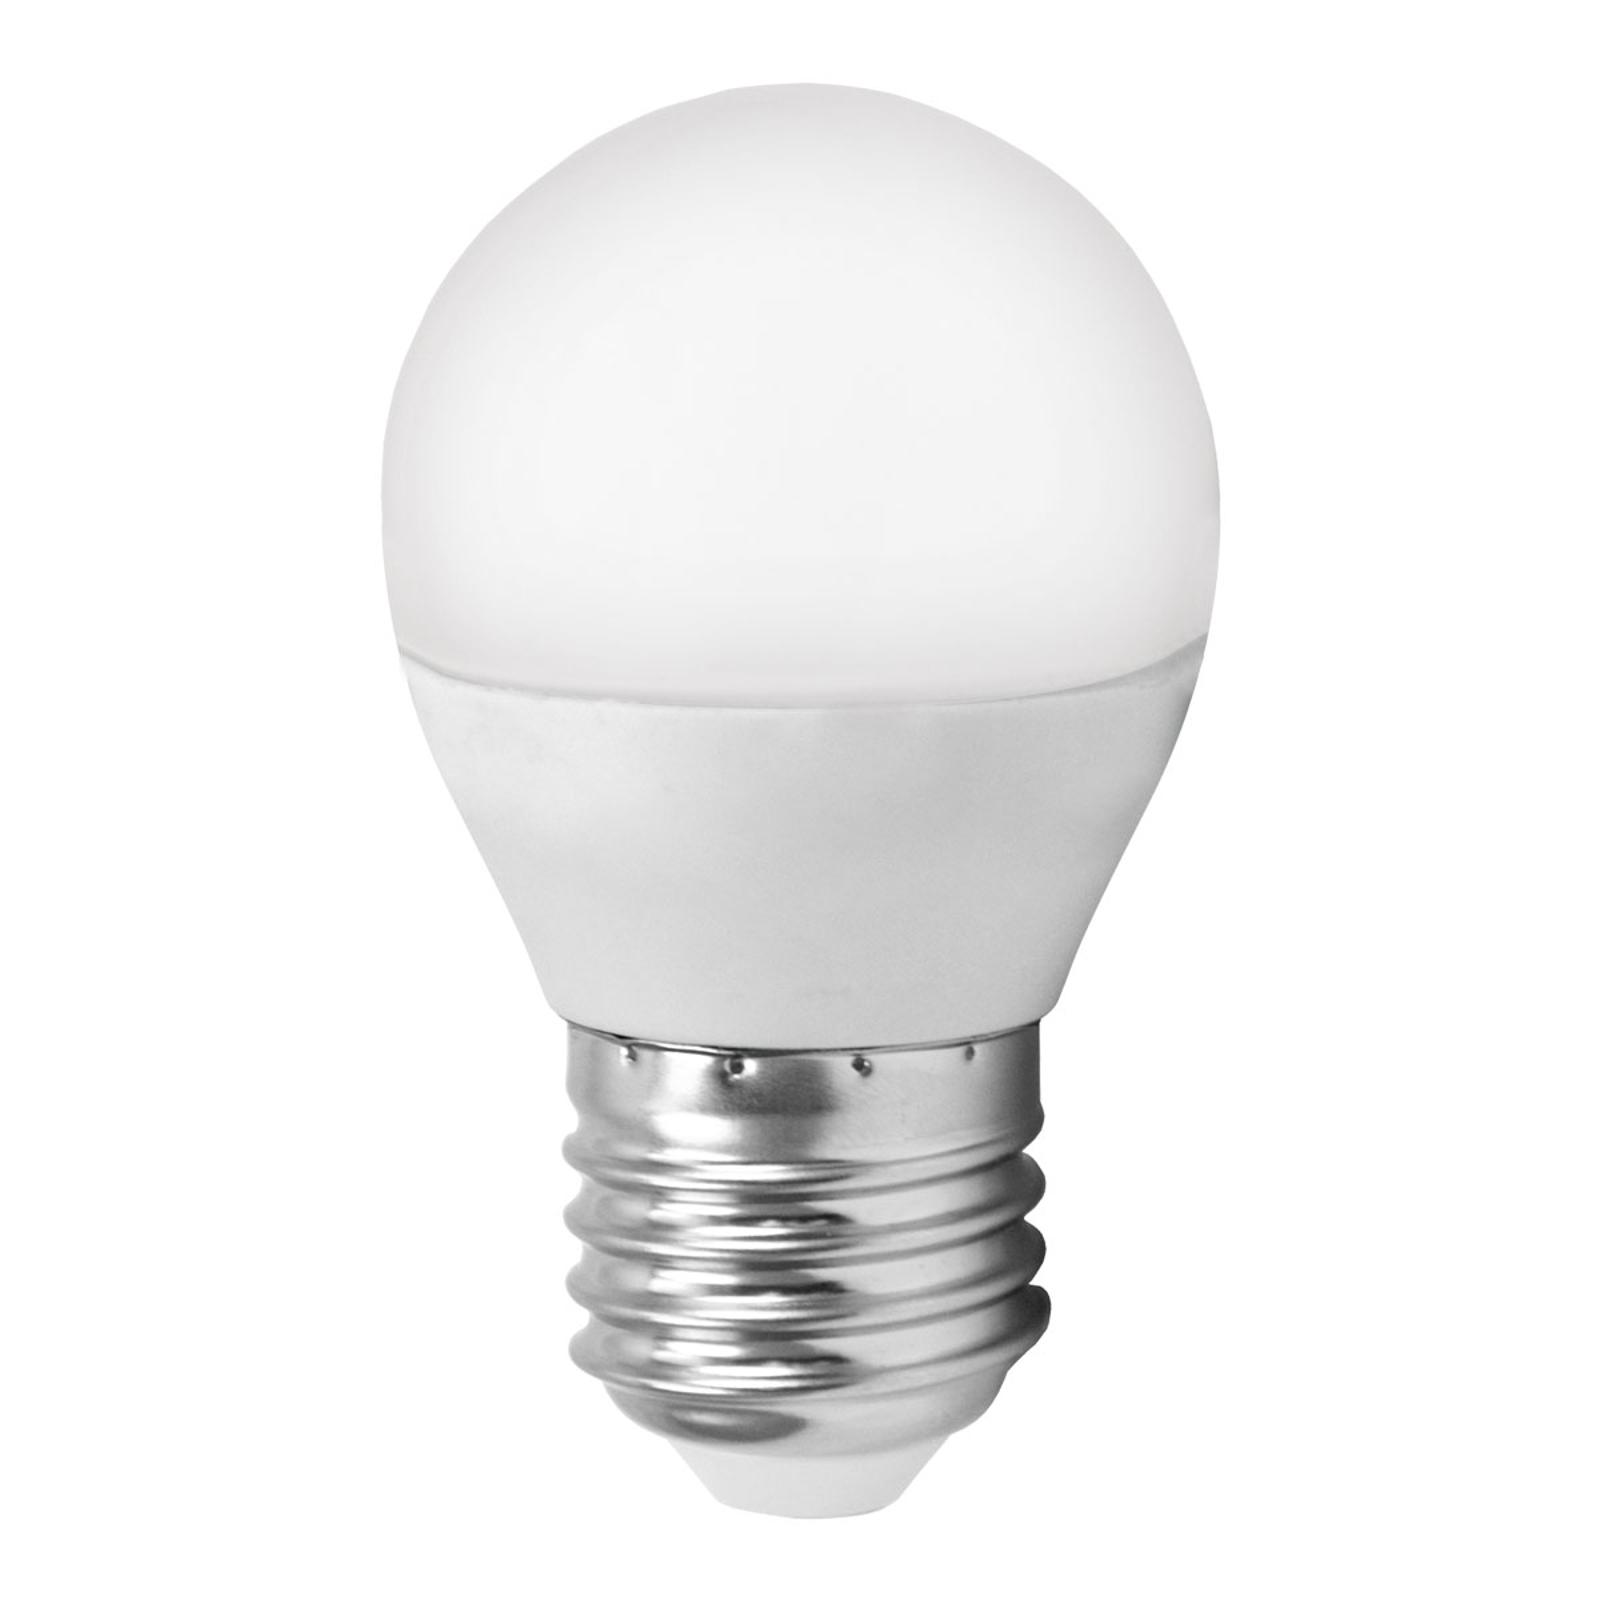 LED-Lampe E27 G45 4W MiniGlobe, universalweiß